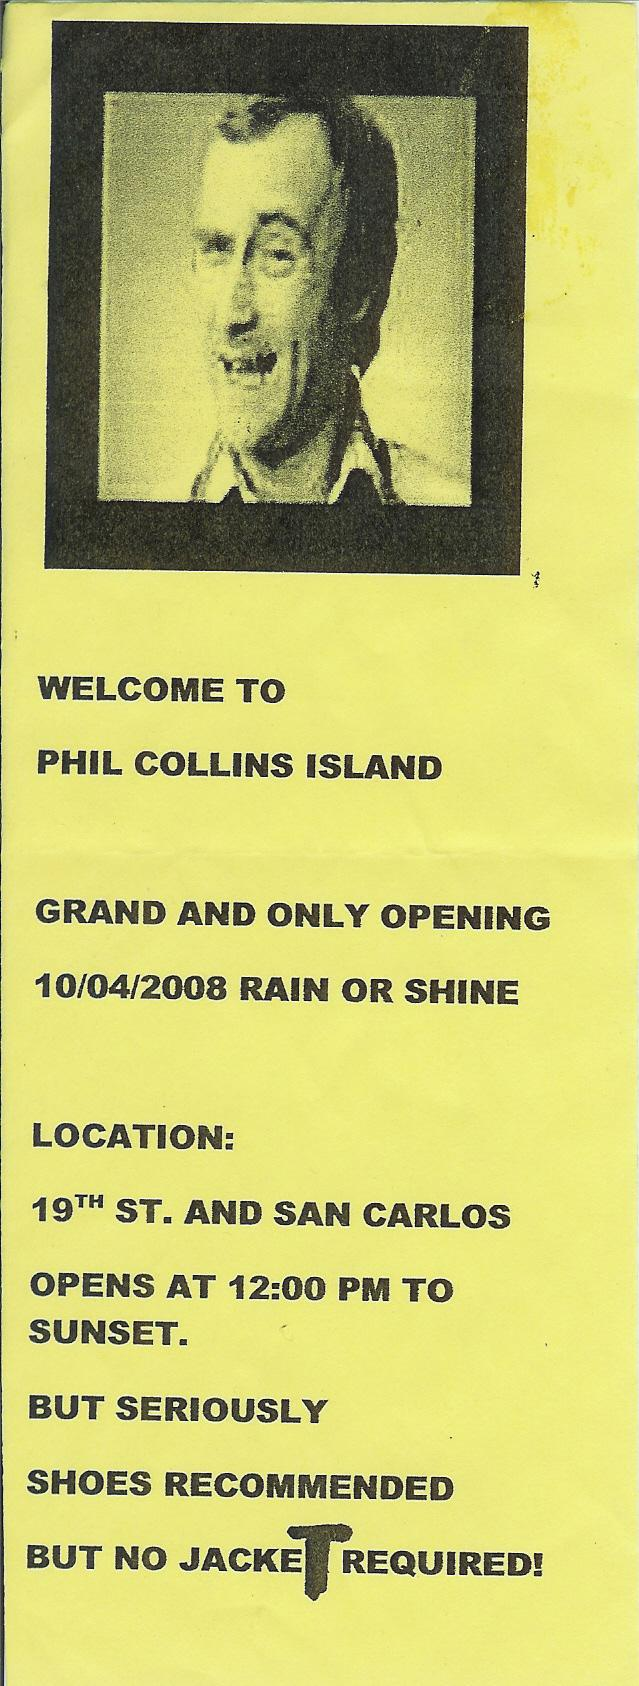 phil collins island.jpg